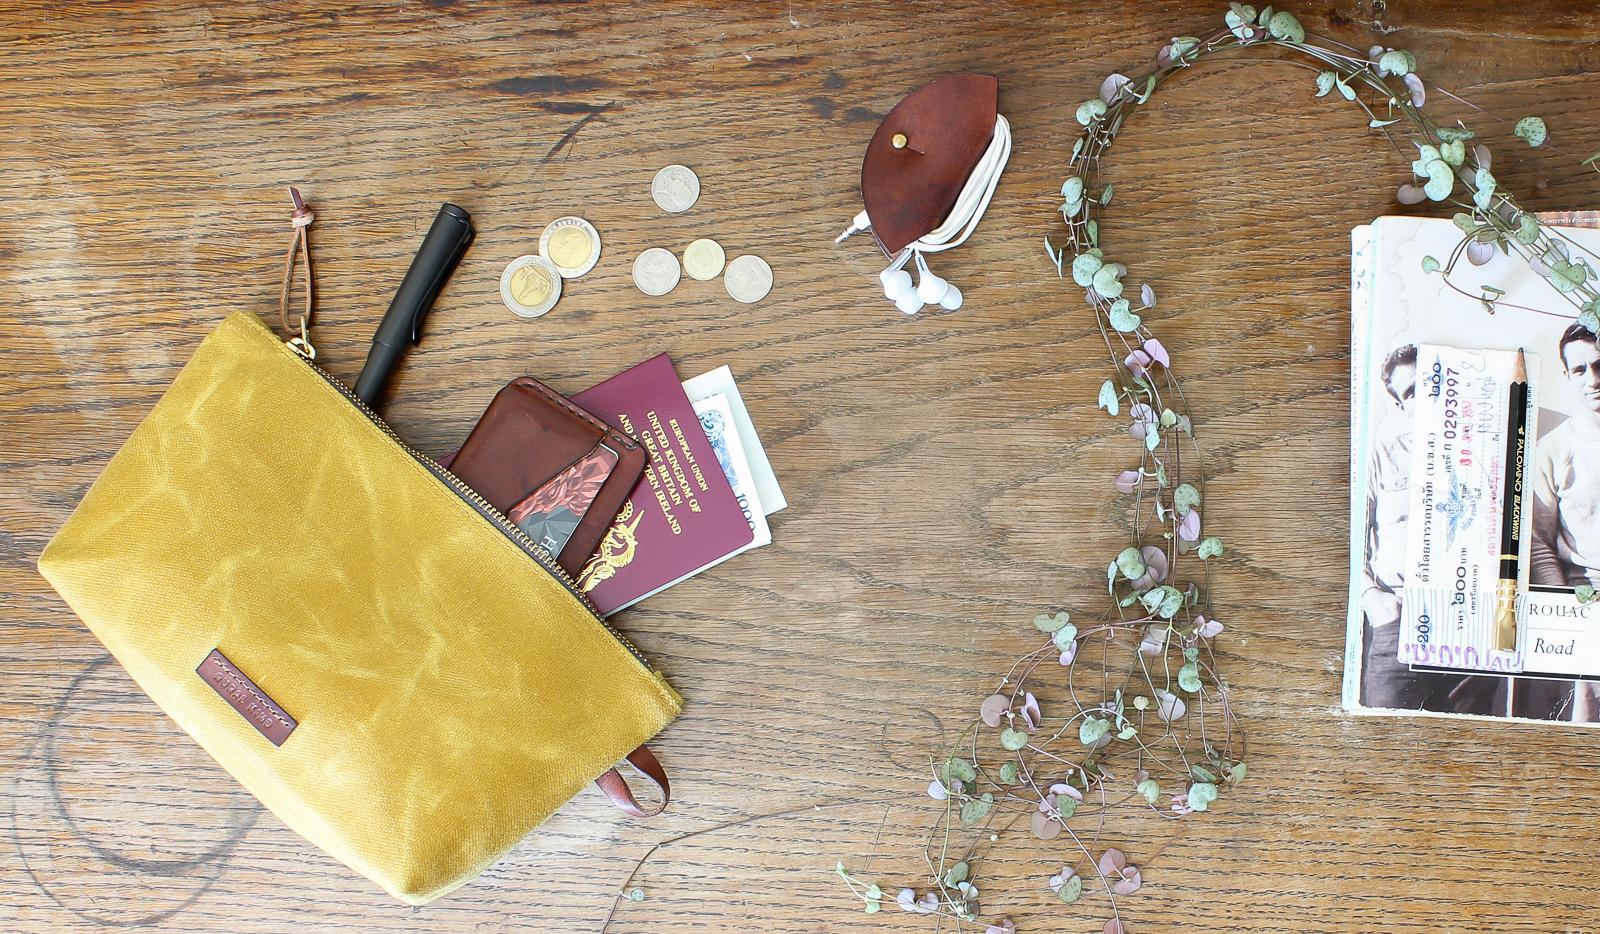 Rural-Kind-Handmade-Zip-Pouch-UK-110.jpg